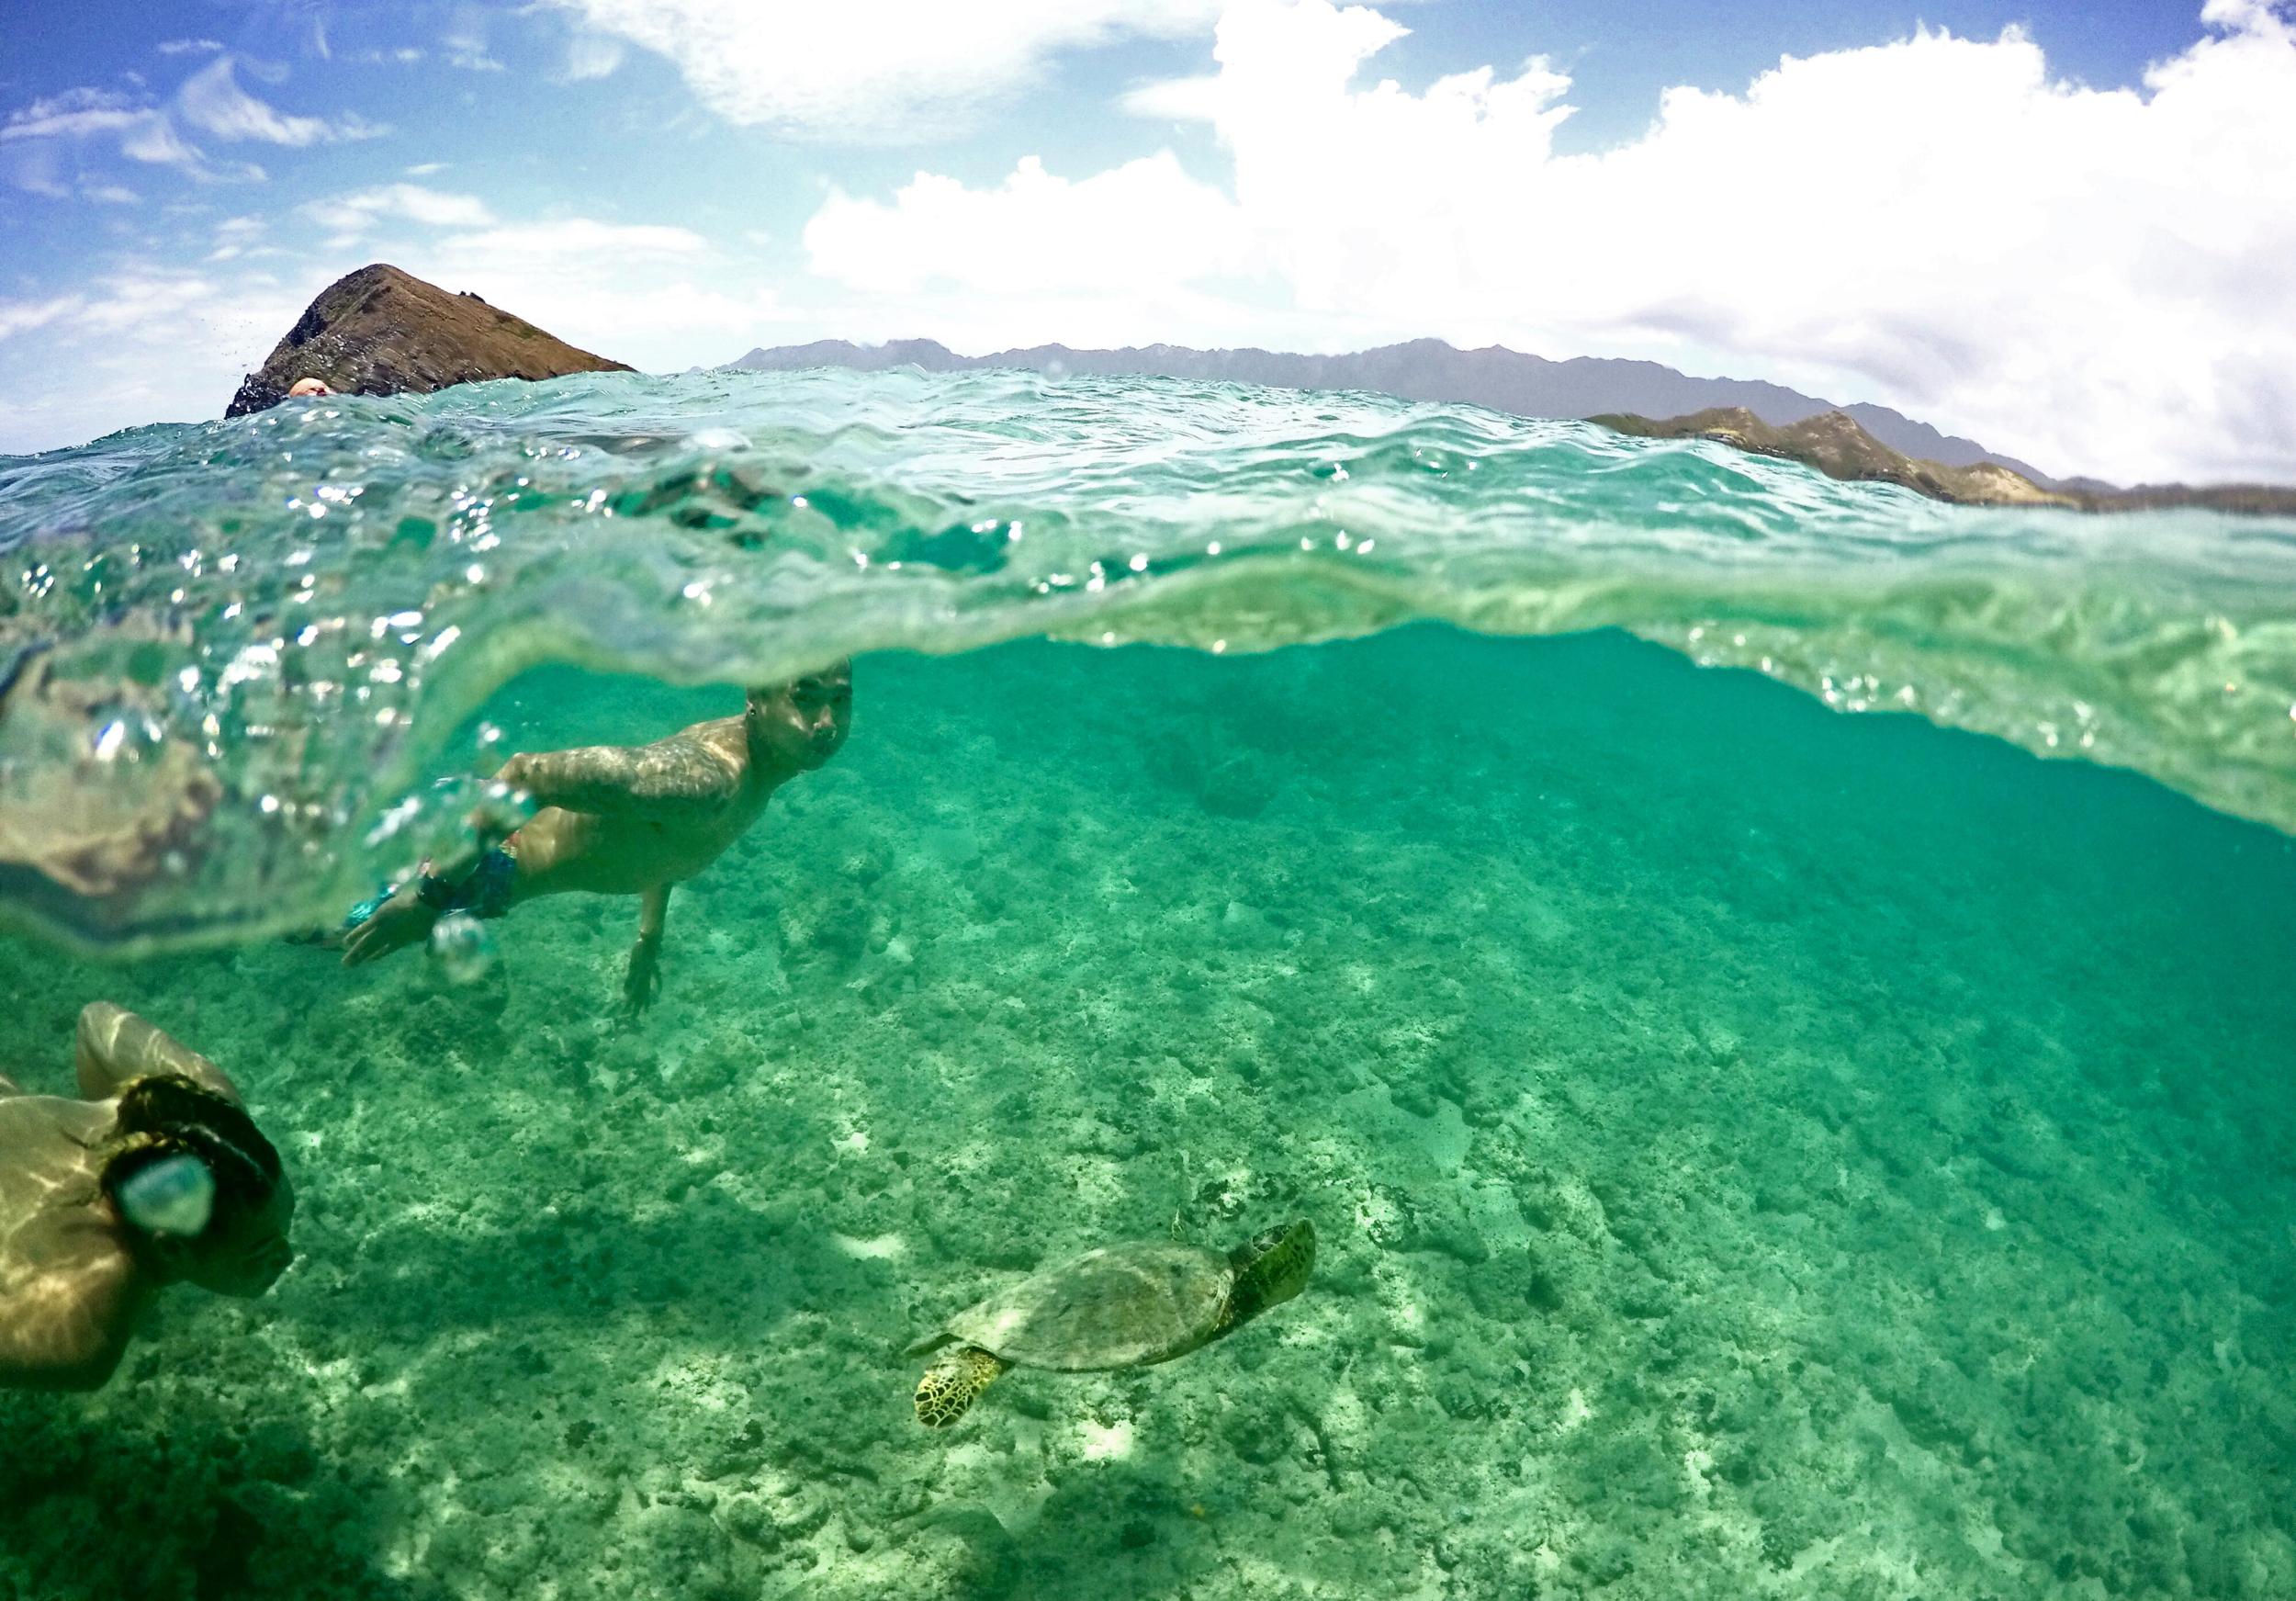 turtleswim.png